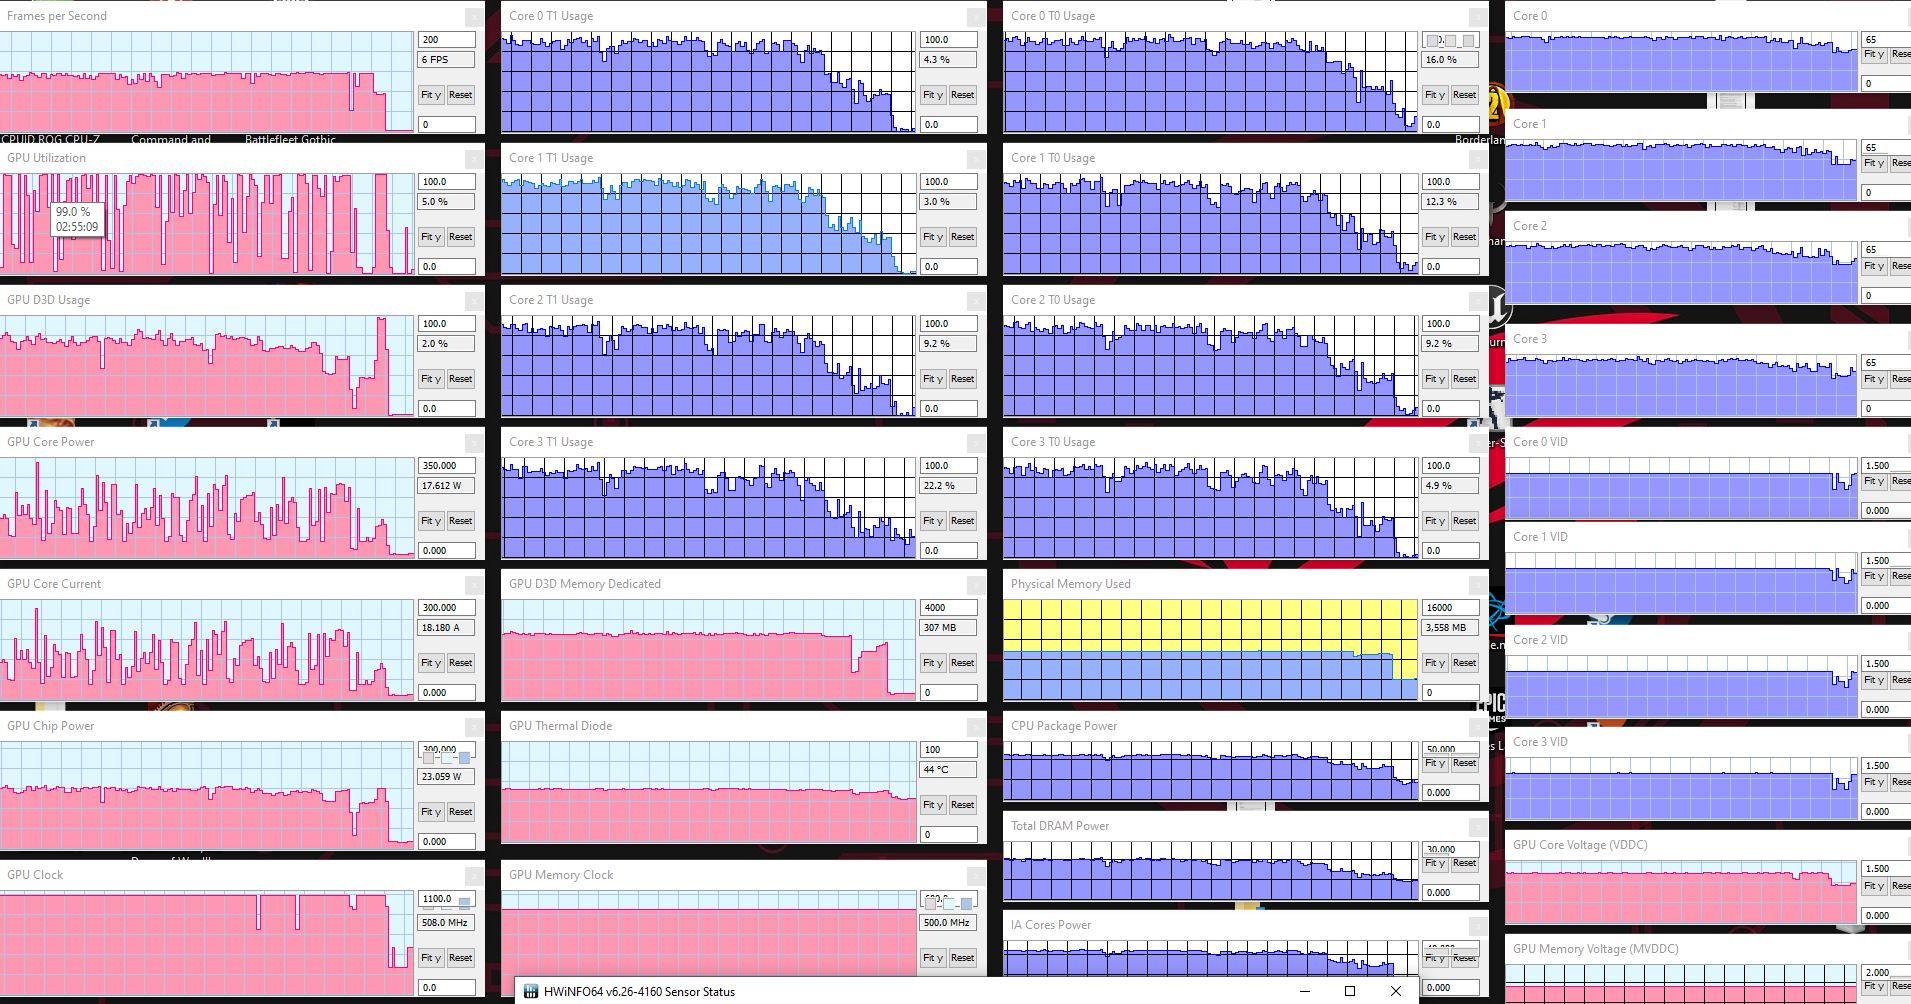 BF5_1920x1080_100%render_low_Flugplatz2_maxFPS120.JPG